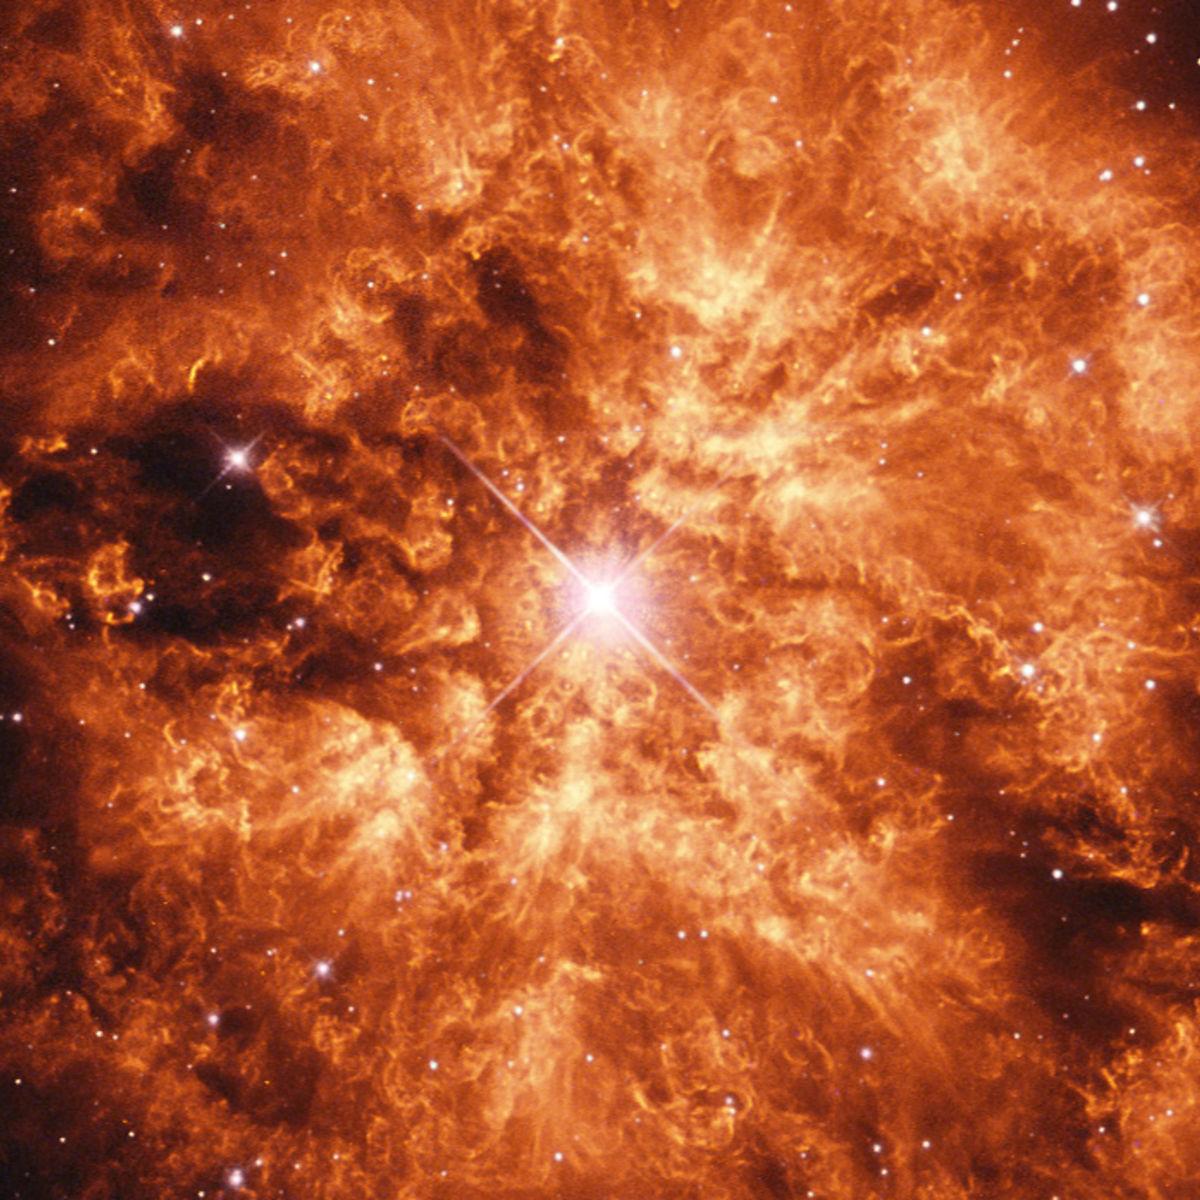 The huge nebula M1-67 around the Wolf-Rayet star WR124. Credit: ESA/Hubble & NASA / Judy Schmidt